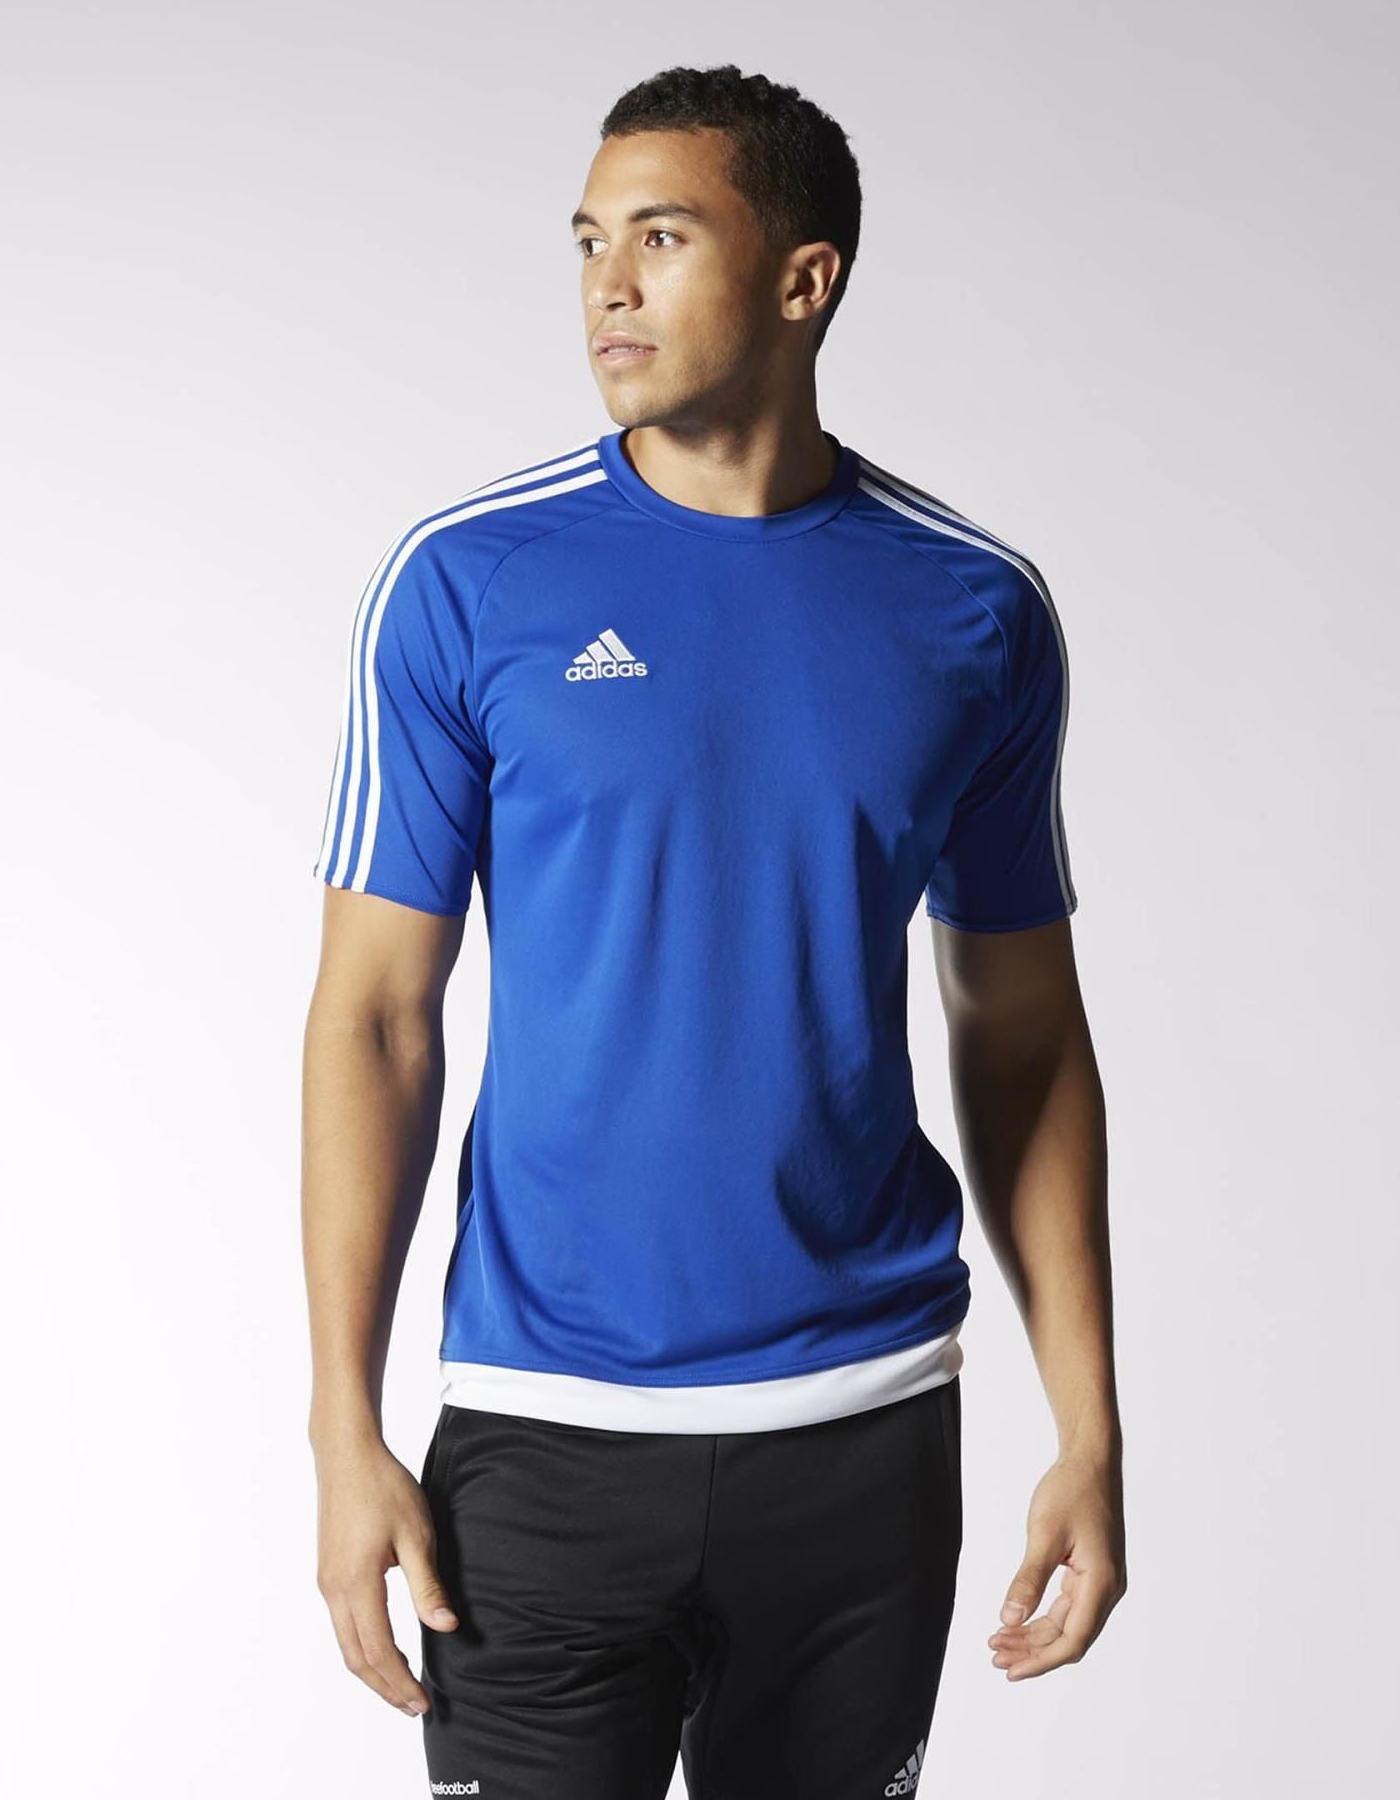 estro 15 top adidas training shirt short sleeves men. Black Bedroom Furniture Sets. Home Design Ideas